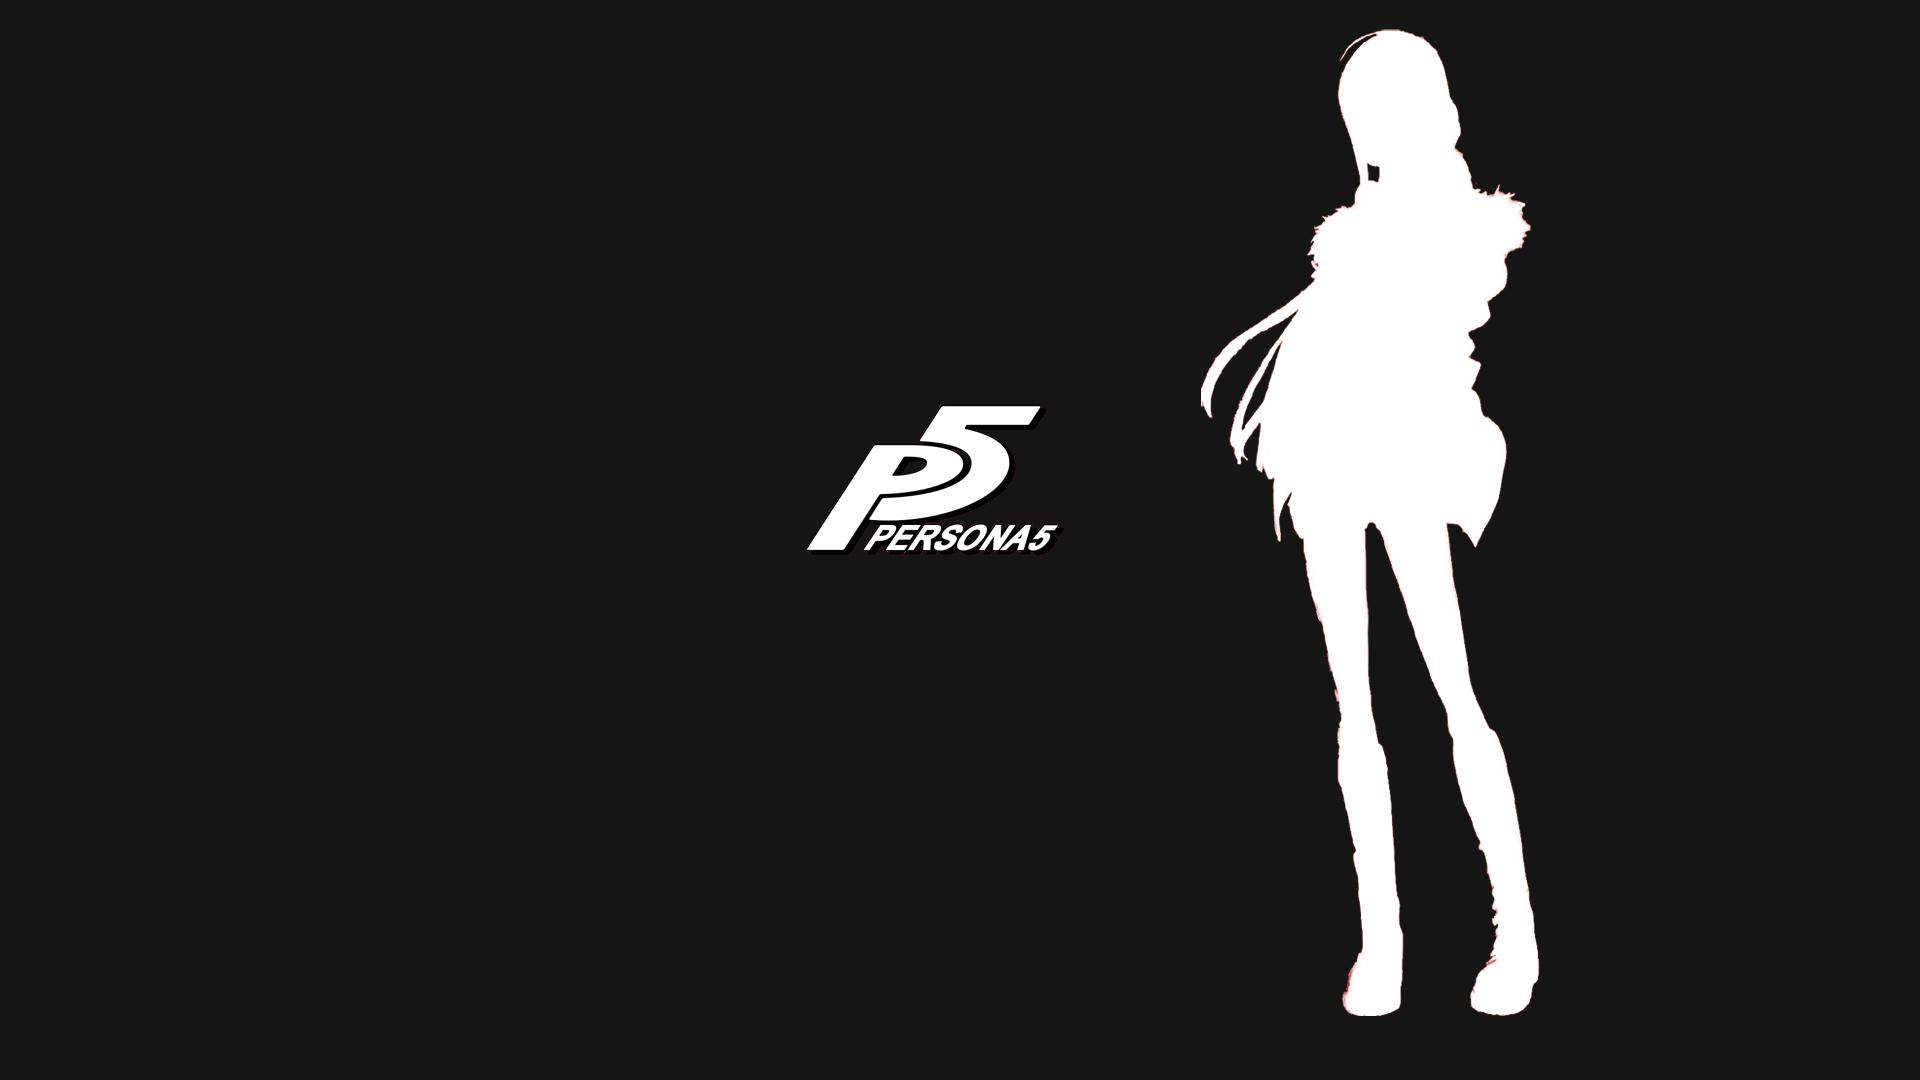 Persona 5 wallpaper BlackWhite 1920x1080